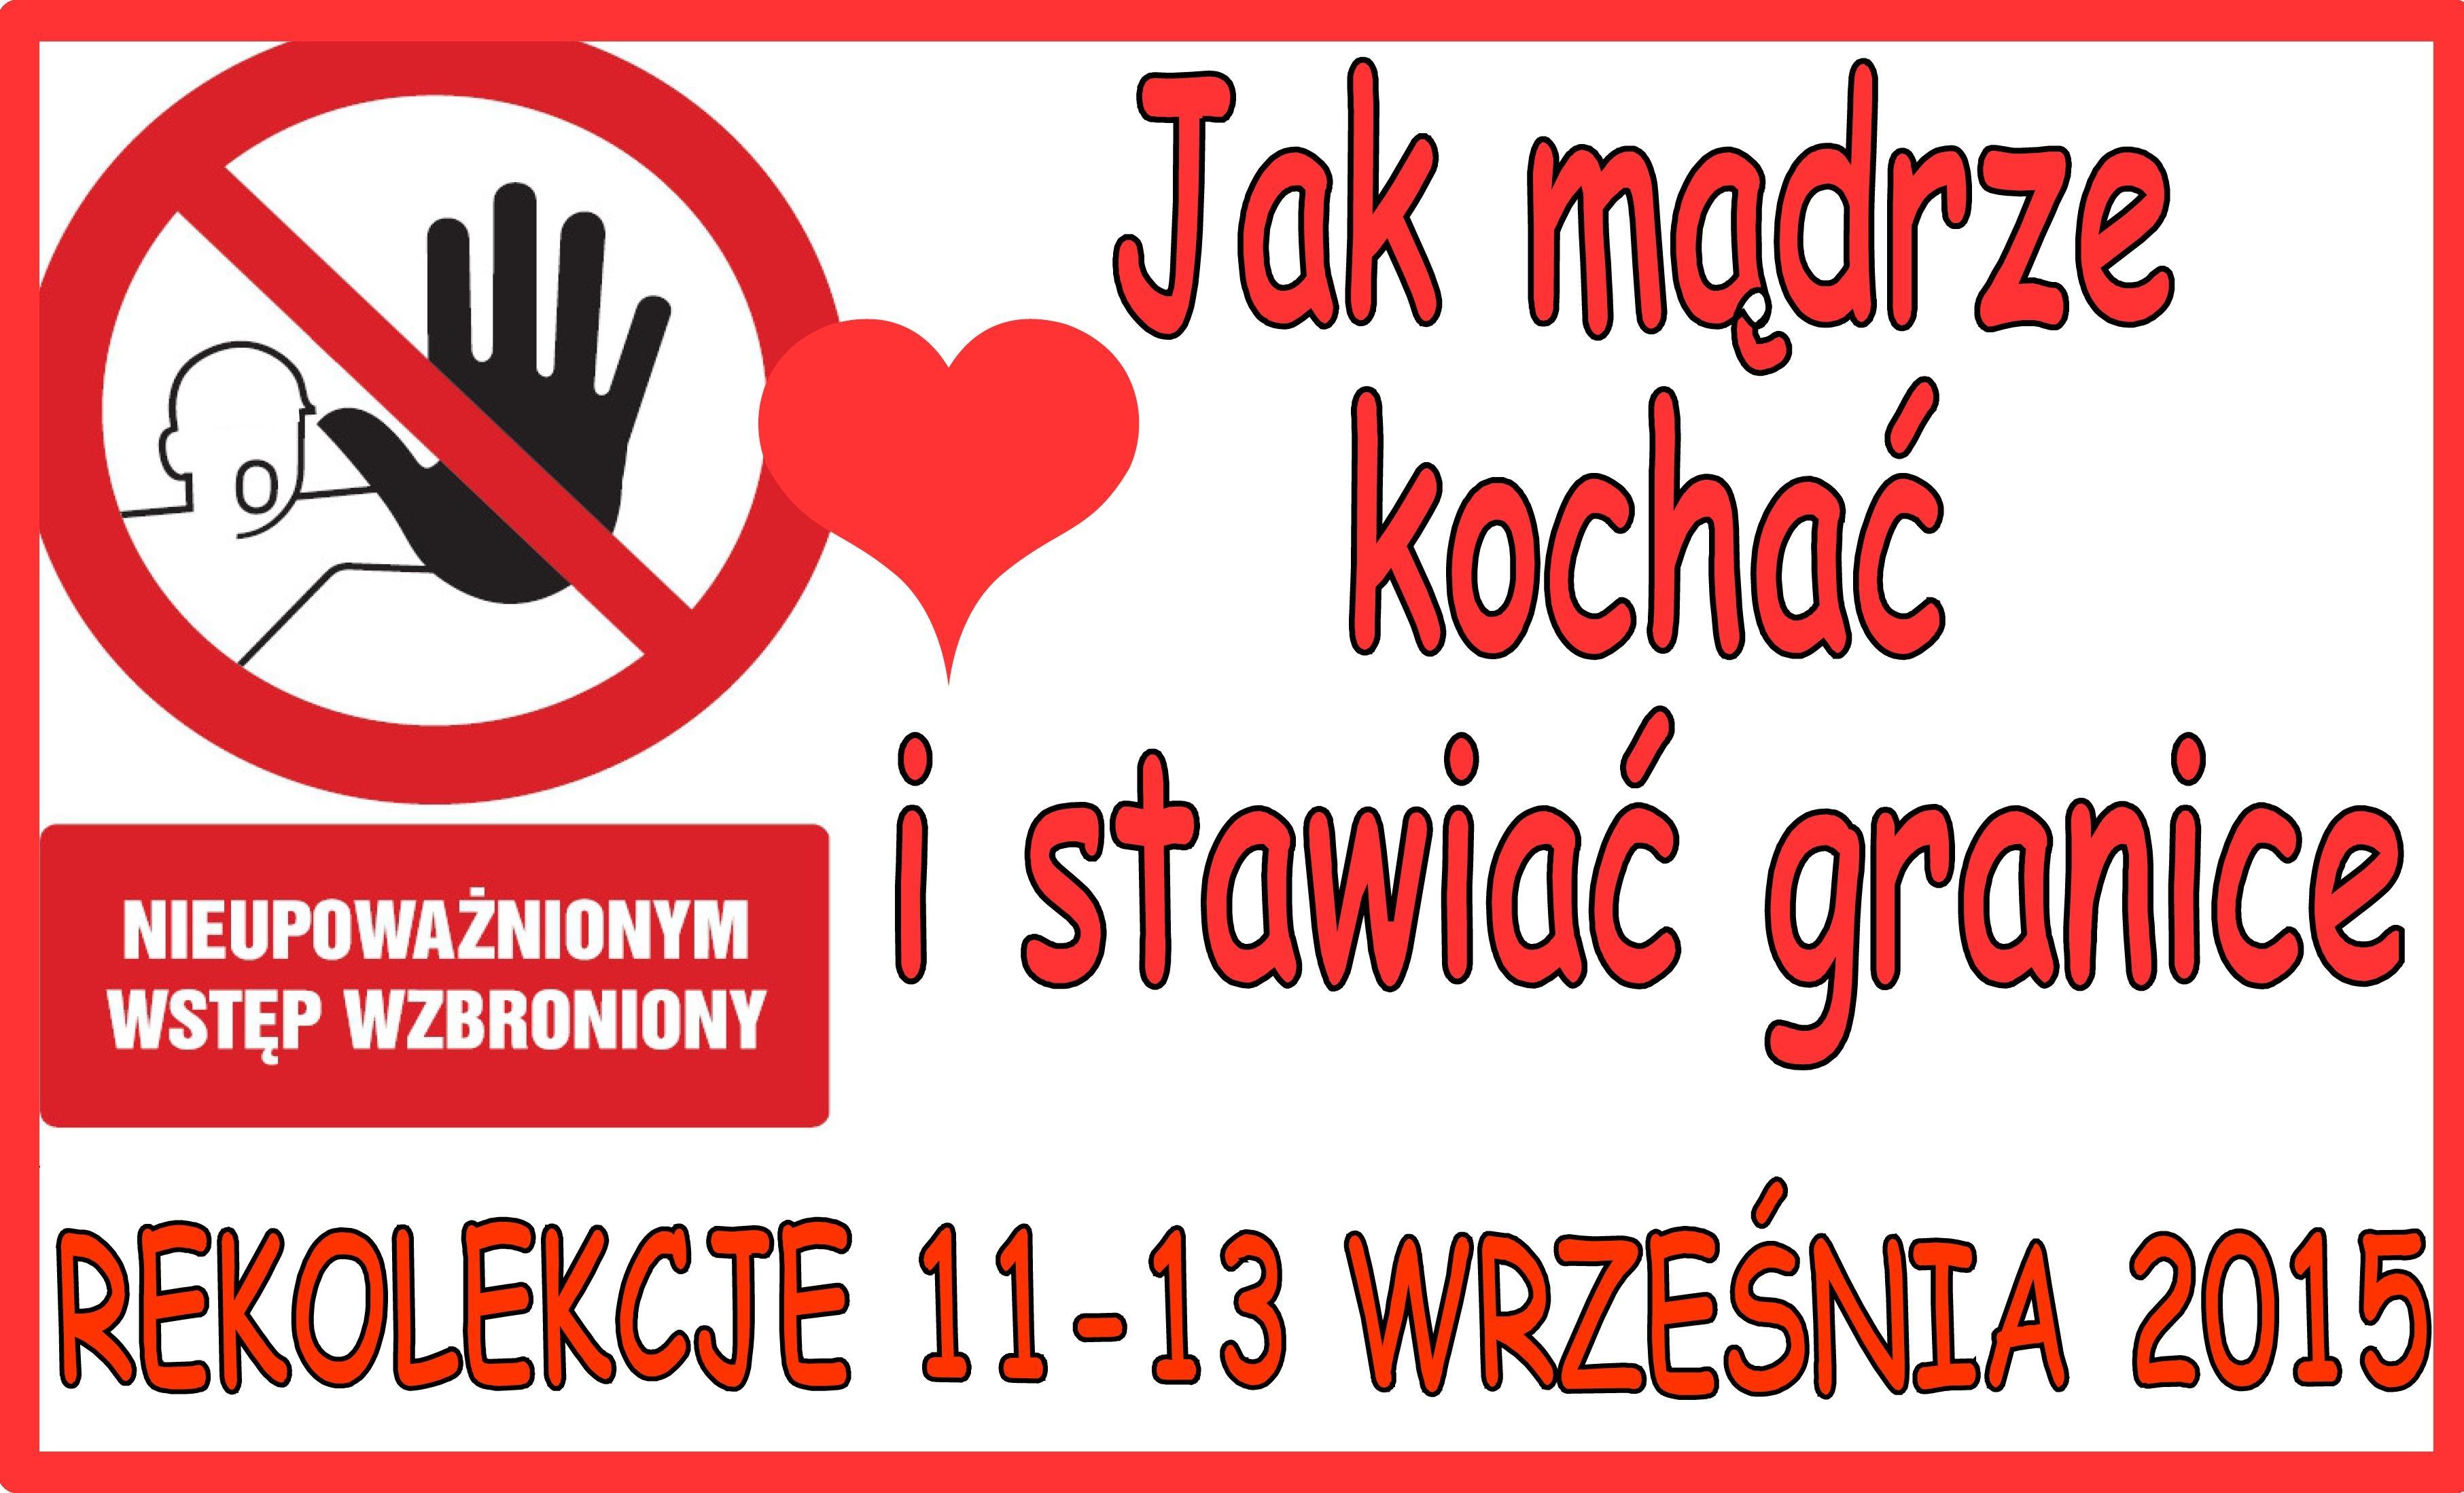 http://www.osrodek-brynow.pl/wp-content/uploads/2014/04/obrazek-granice.jpg